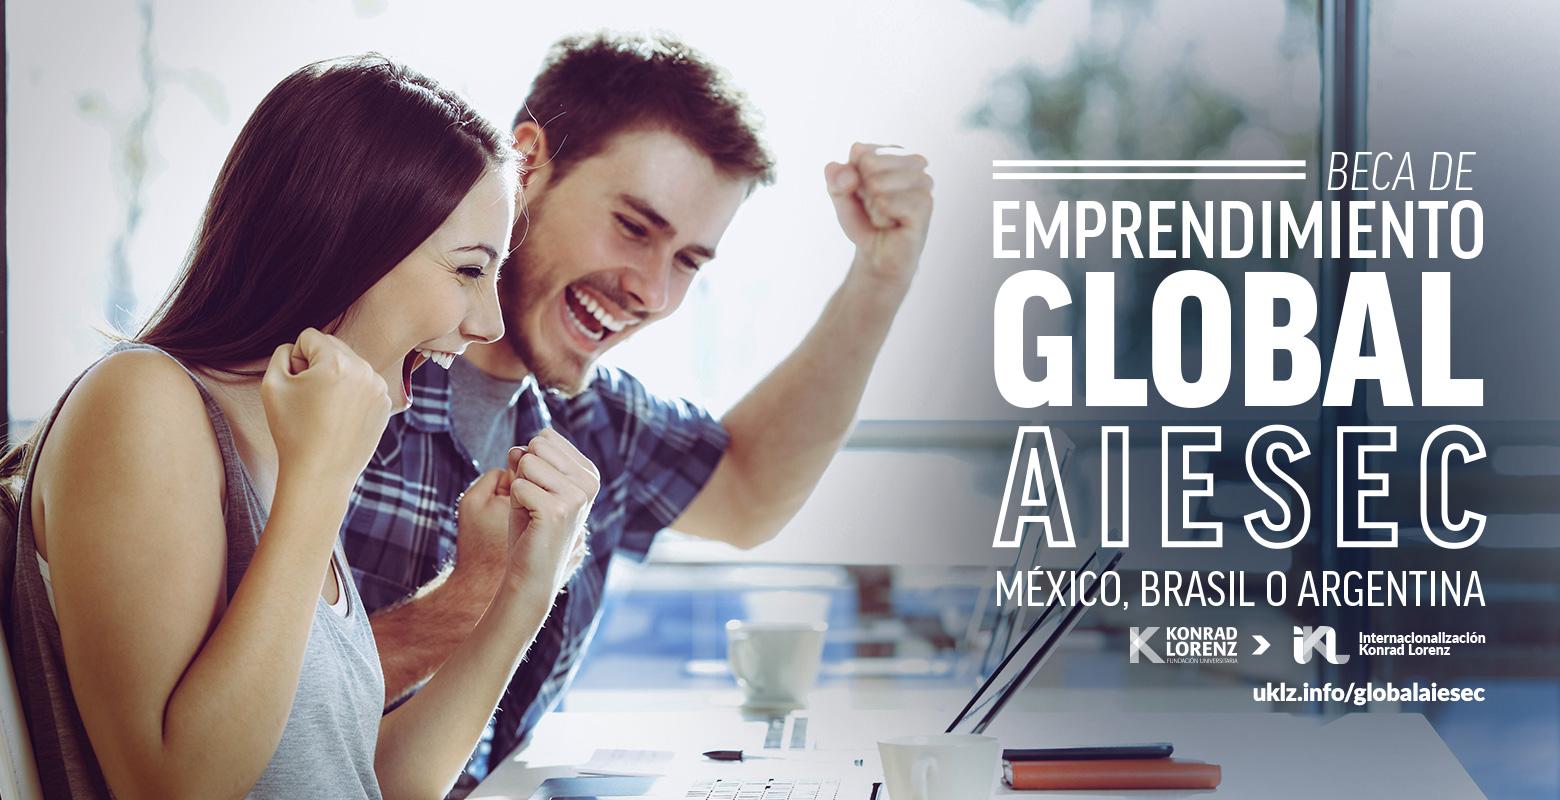 Beca de Emprendimiento Global AIESEC México, Brasil o Argentina.